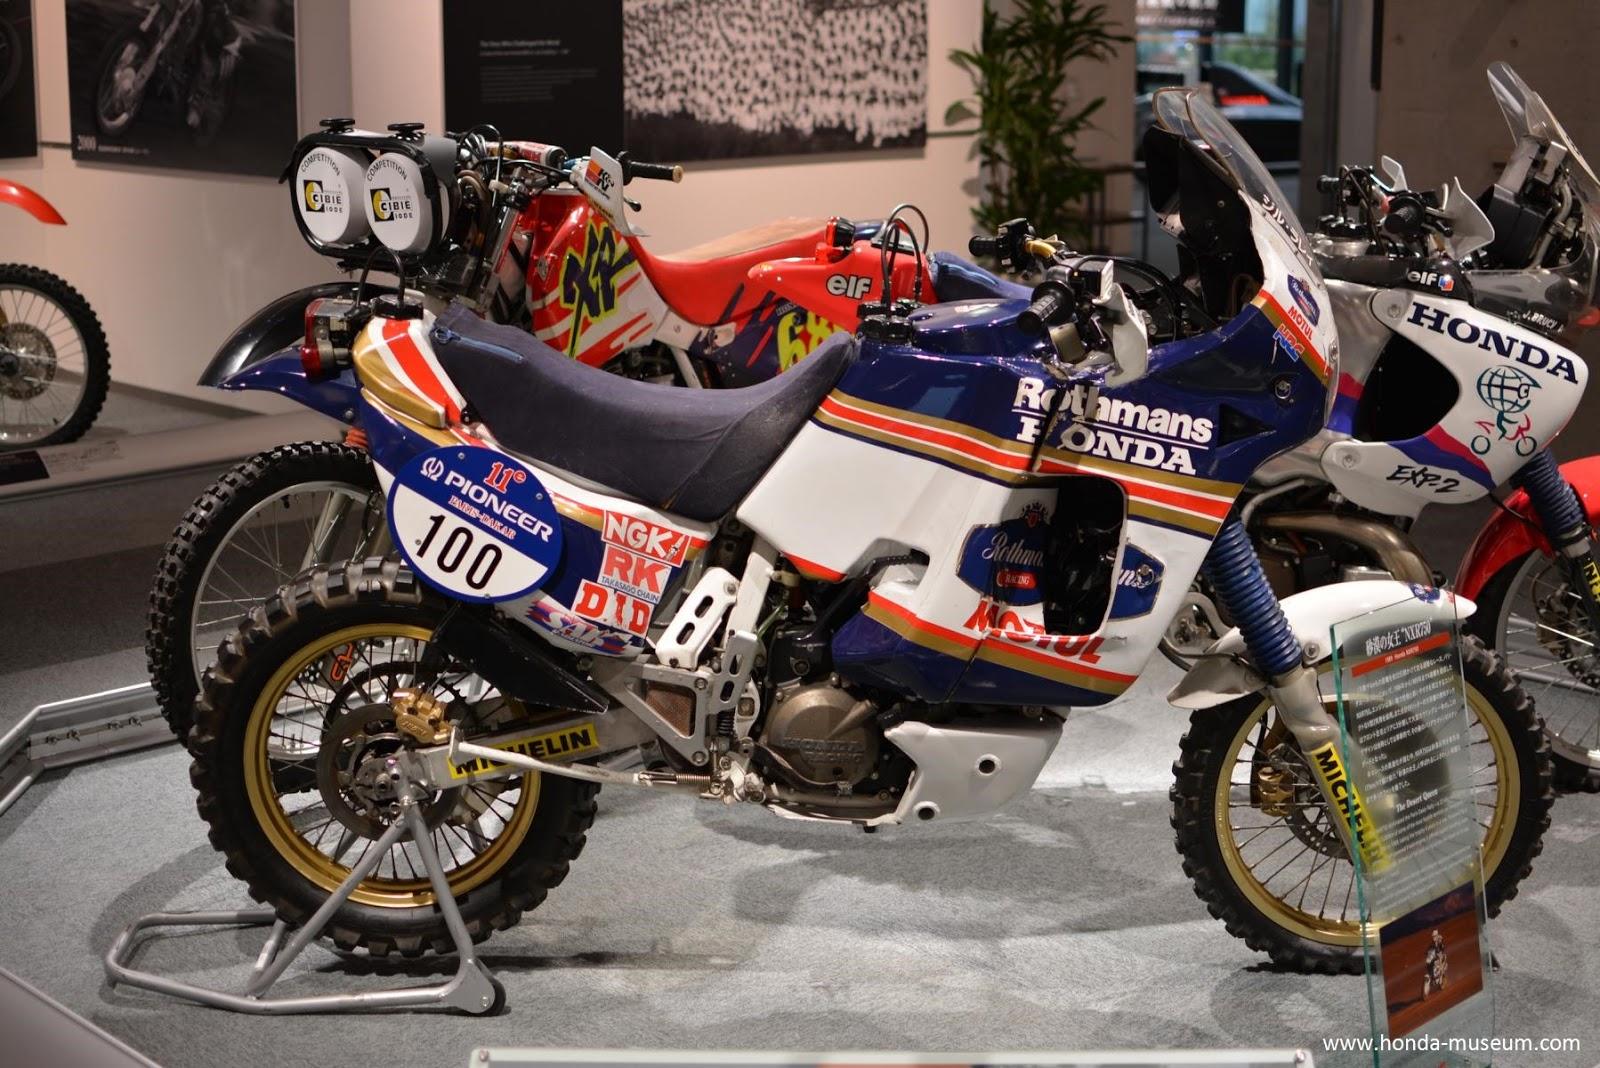 Mad Max Motorcycle >> Africa Twin: Honda - Paris Dakar 1989 - NXR 750